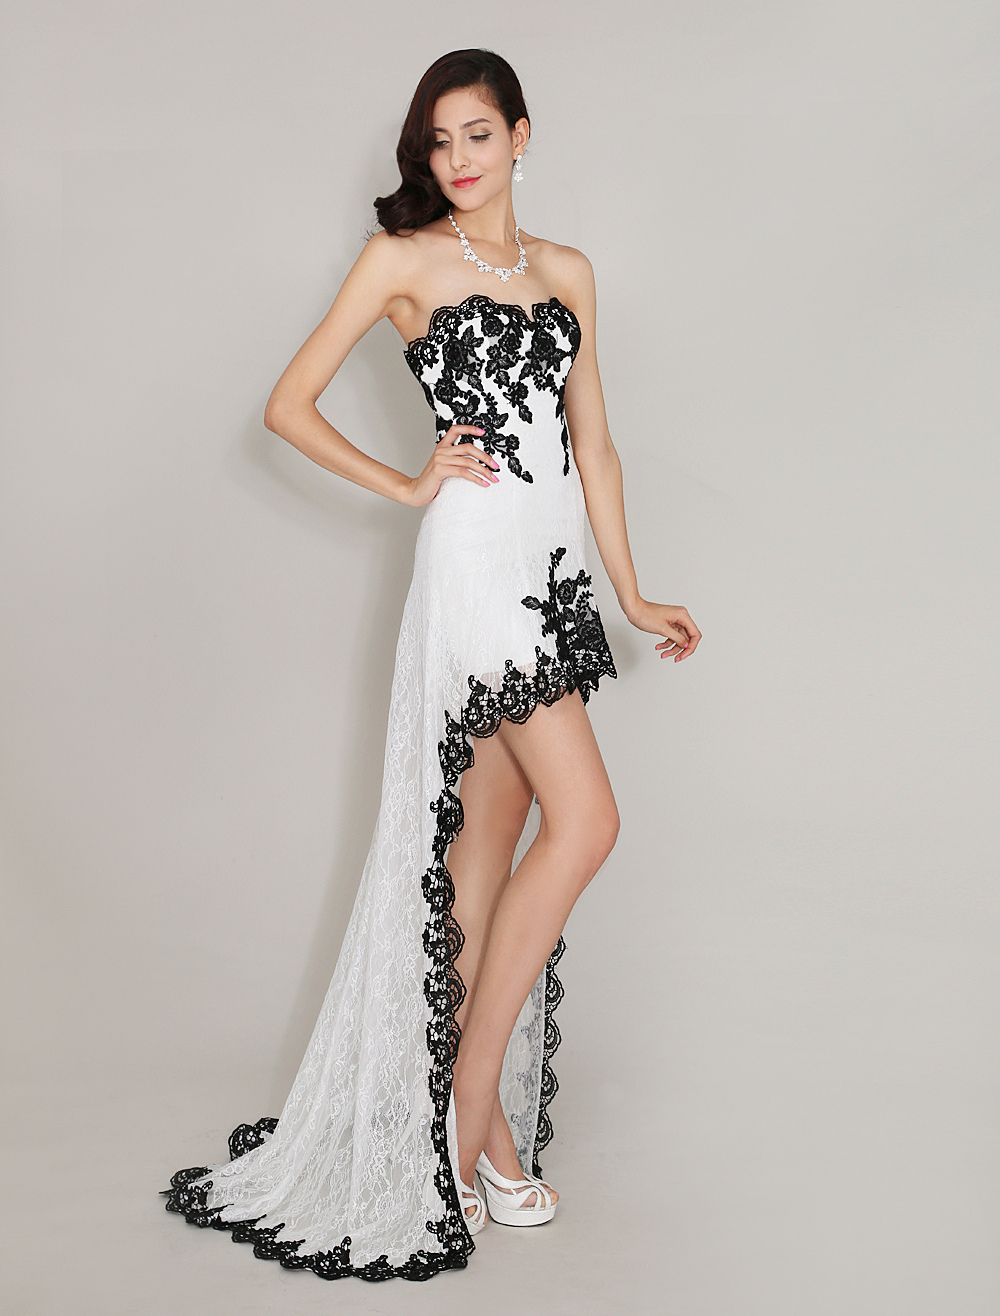 Sweetheart Neck Fantastic Applique Irregular Lace Prom Dress Milanoo